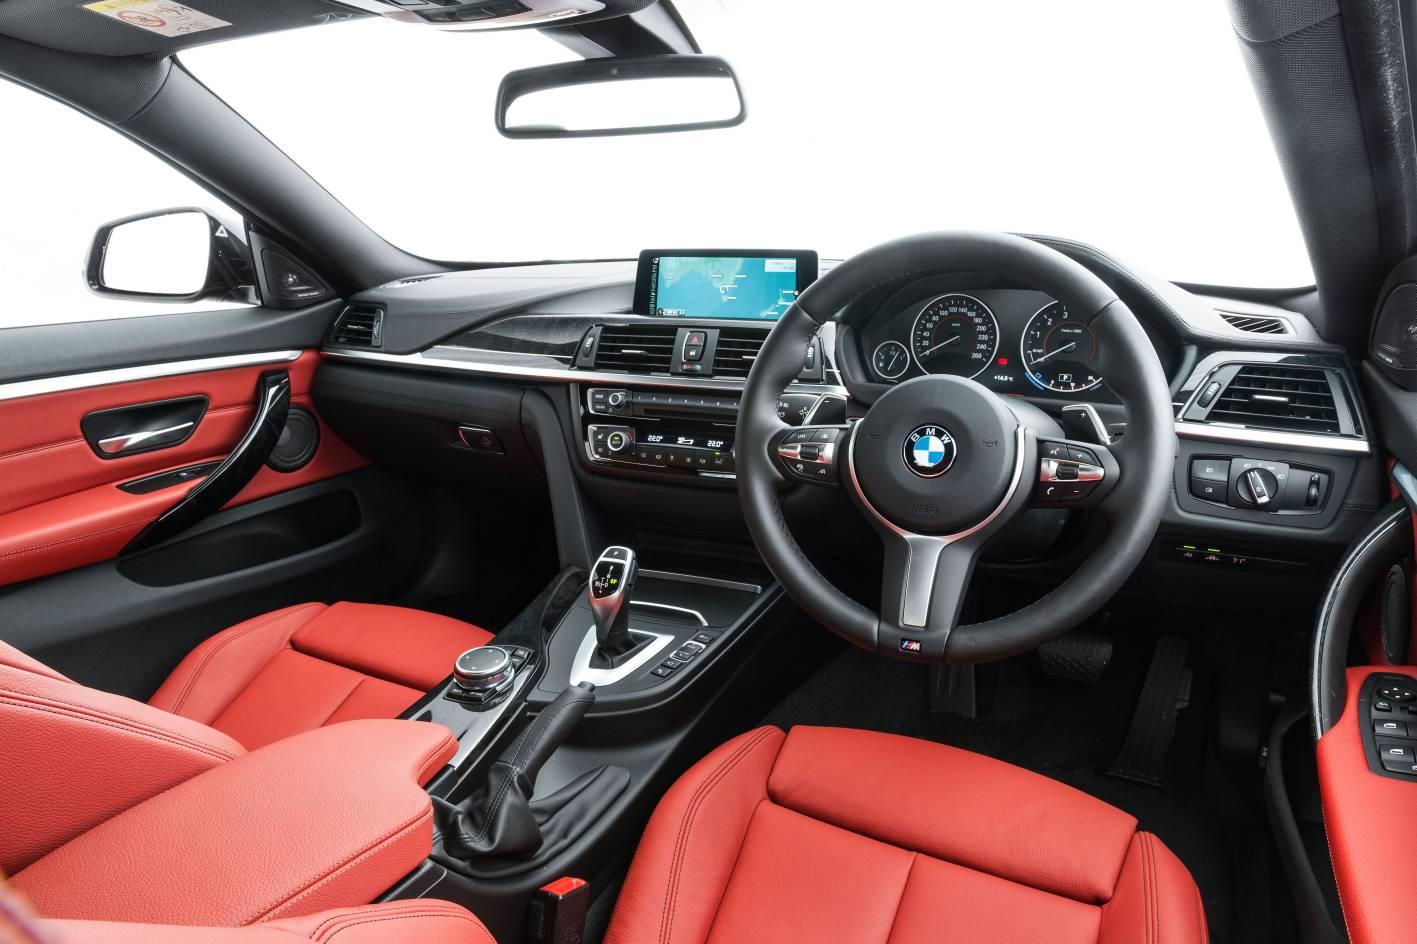 2016 Bmw 4 Series 440i Interior